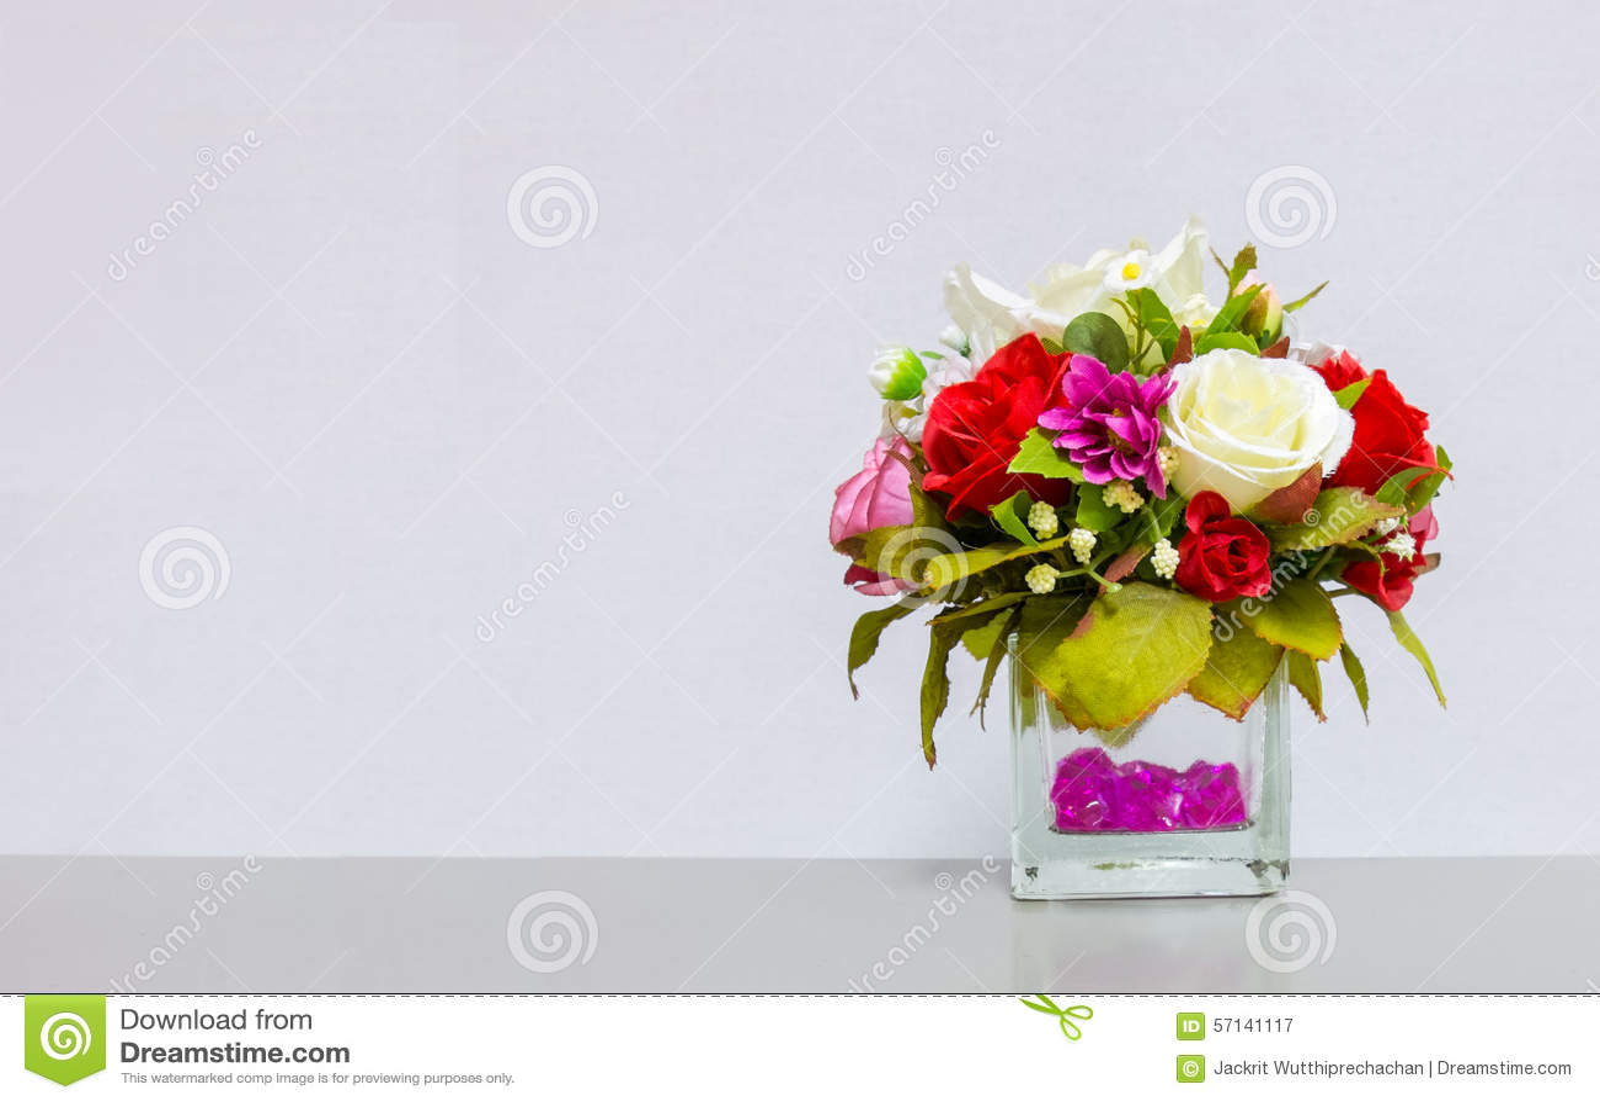 Beautiful flower vase at the corner on gray background with download beautiful flower vase at the corner on gray background with copyspace to input text used izmirmasajfo